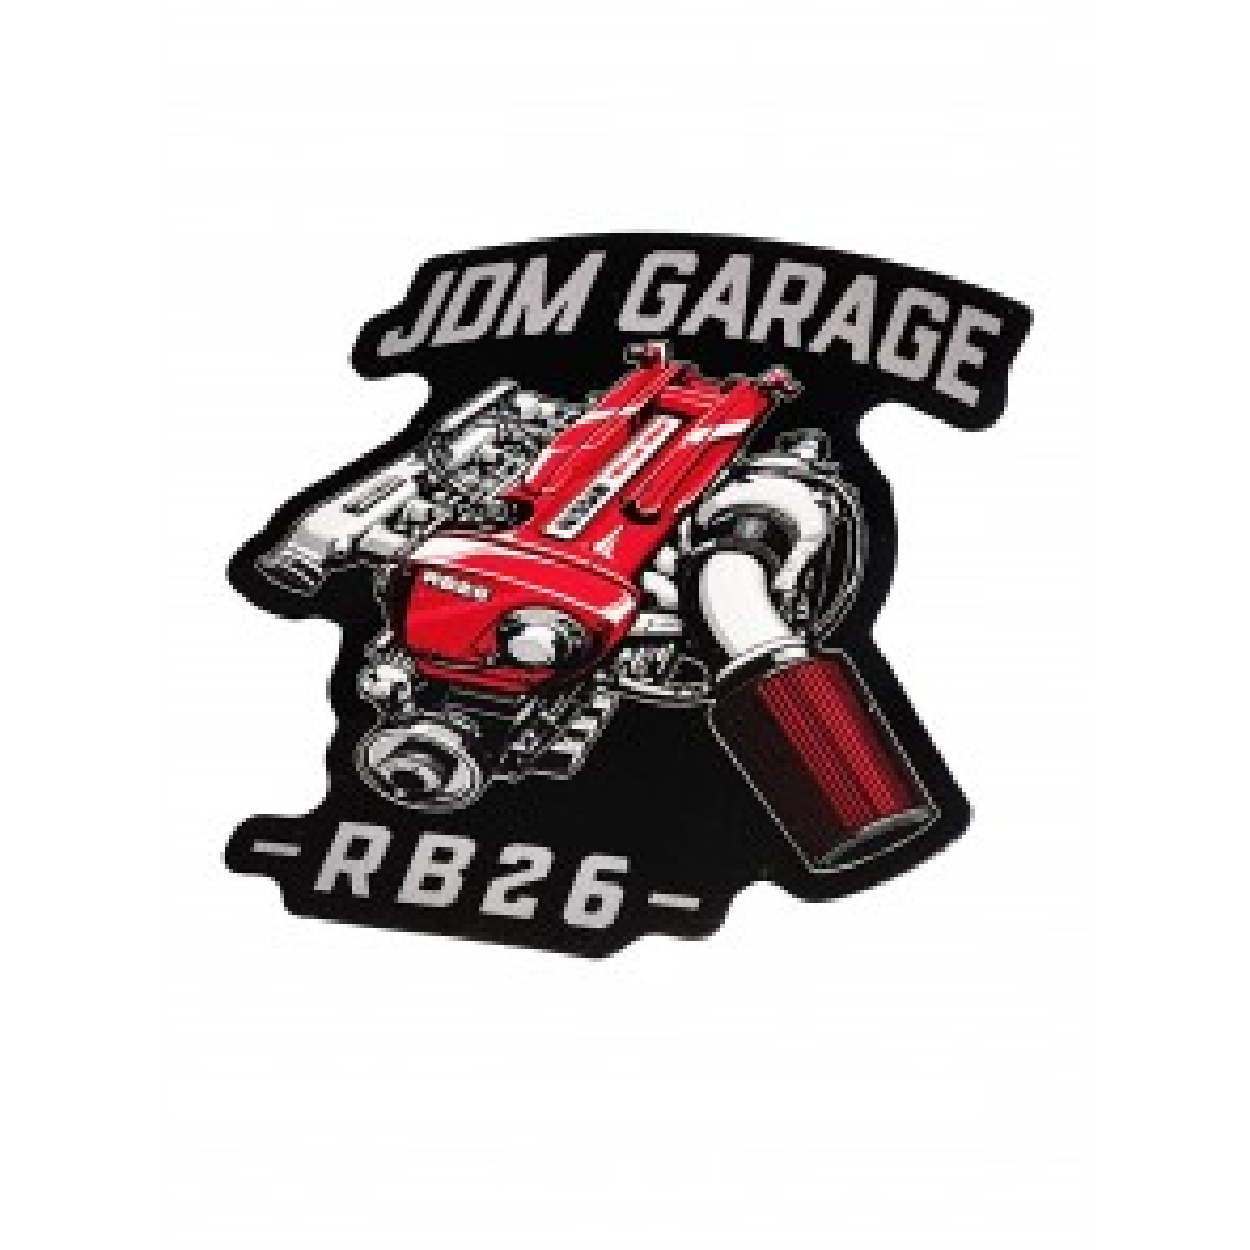 JDMGarageUK RB26 Sticker Black & Grey